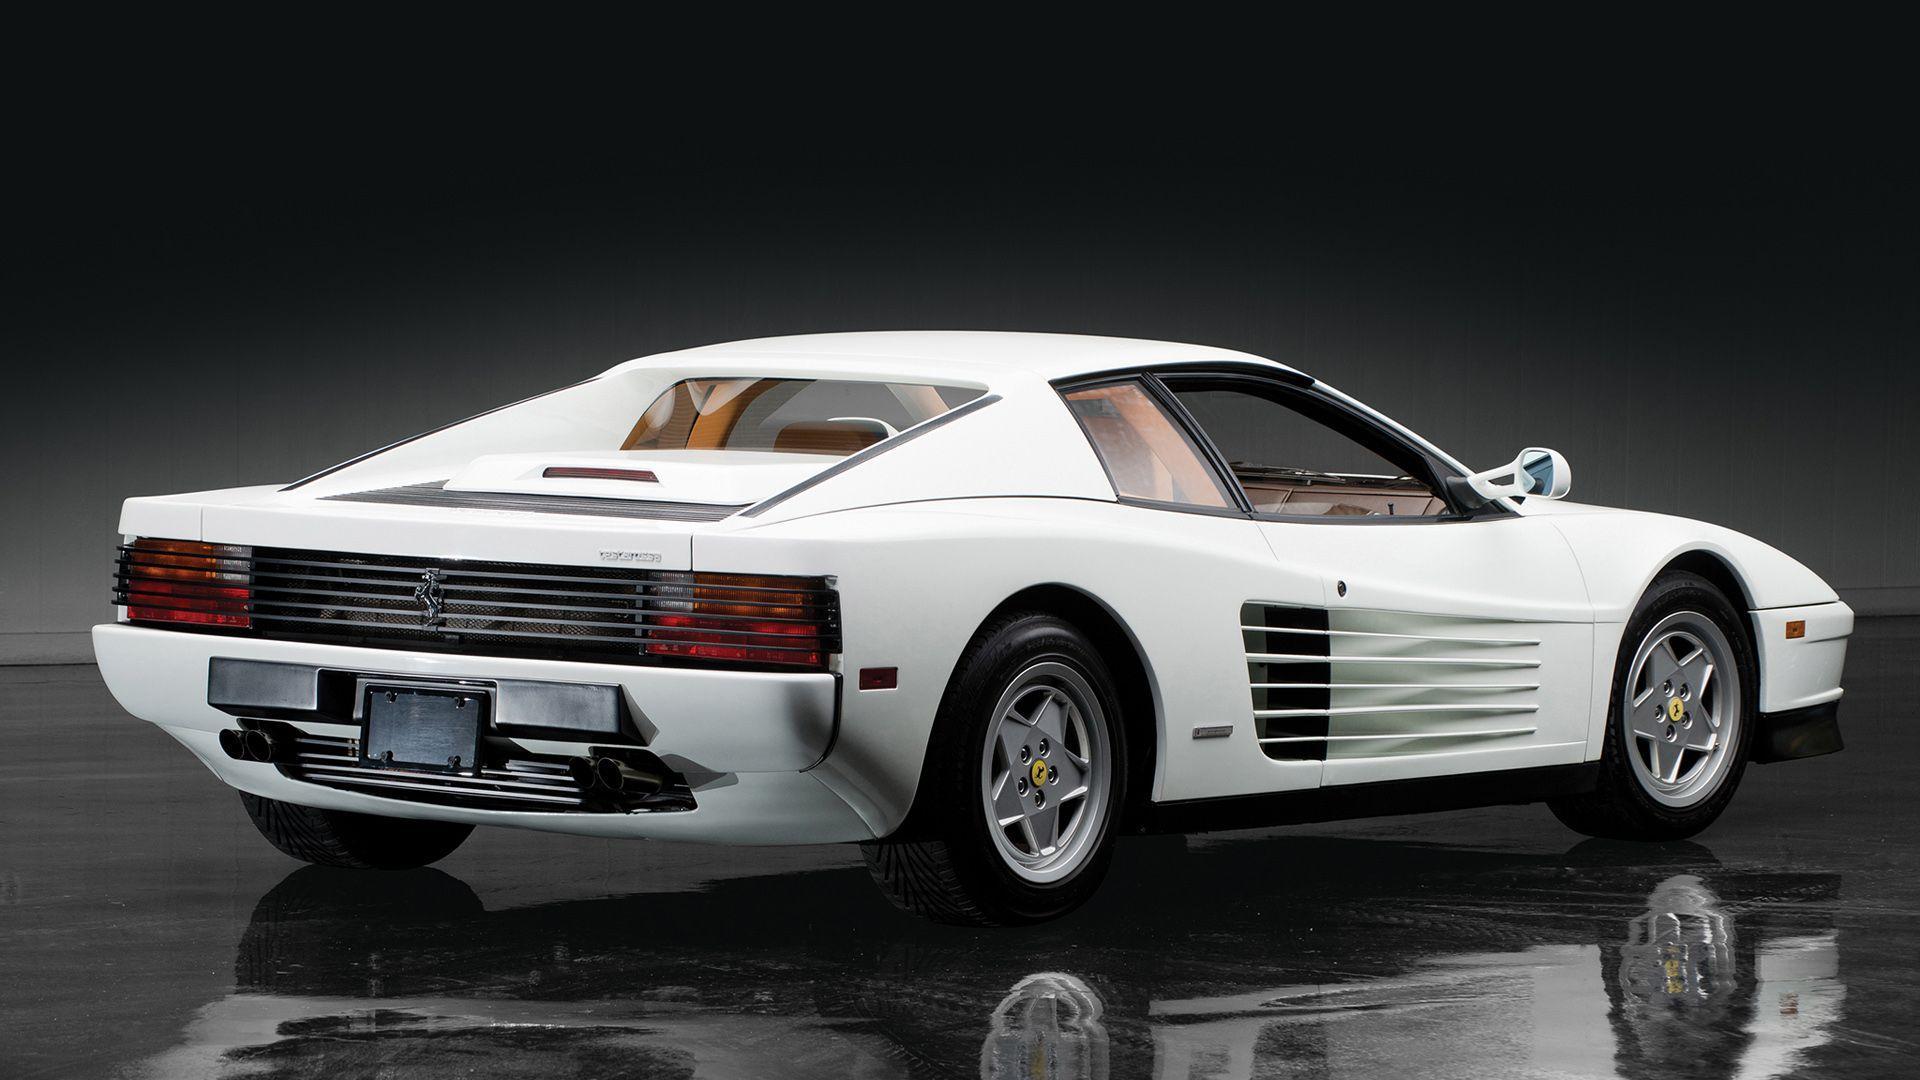 White Ferrari Testarossa Wallpapers Top Free White Ferrari Testarossa Backgrounds Wallpaperaccess